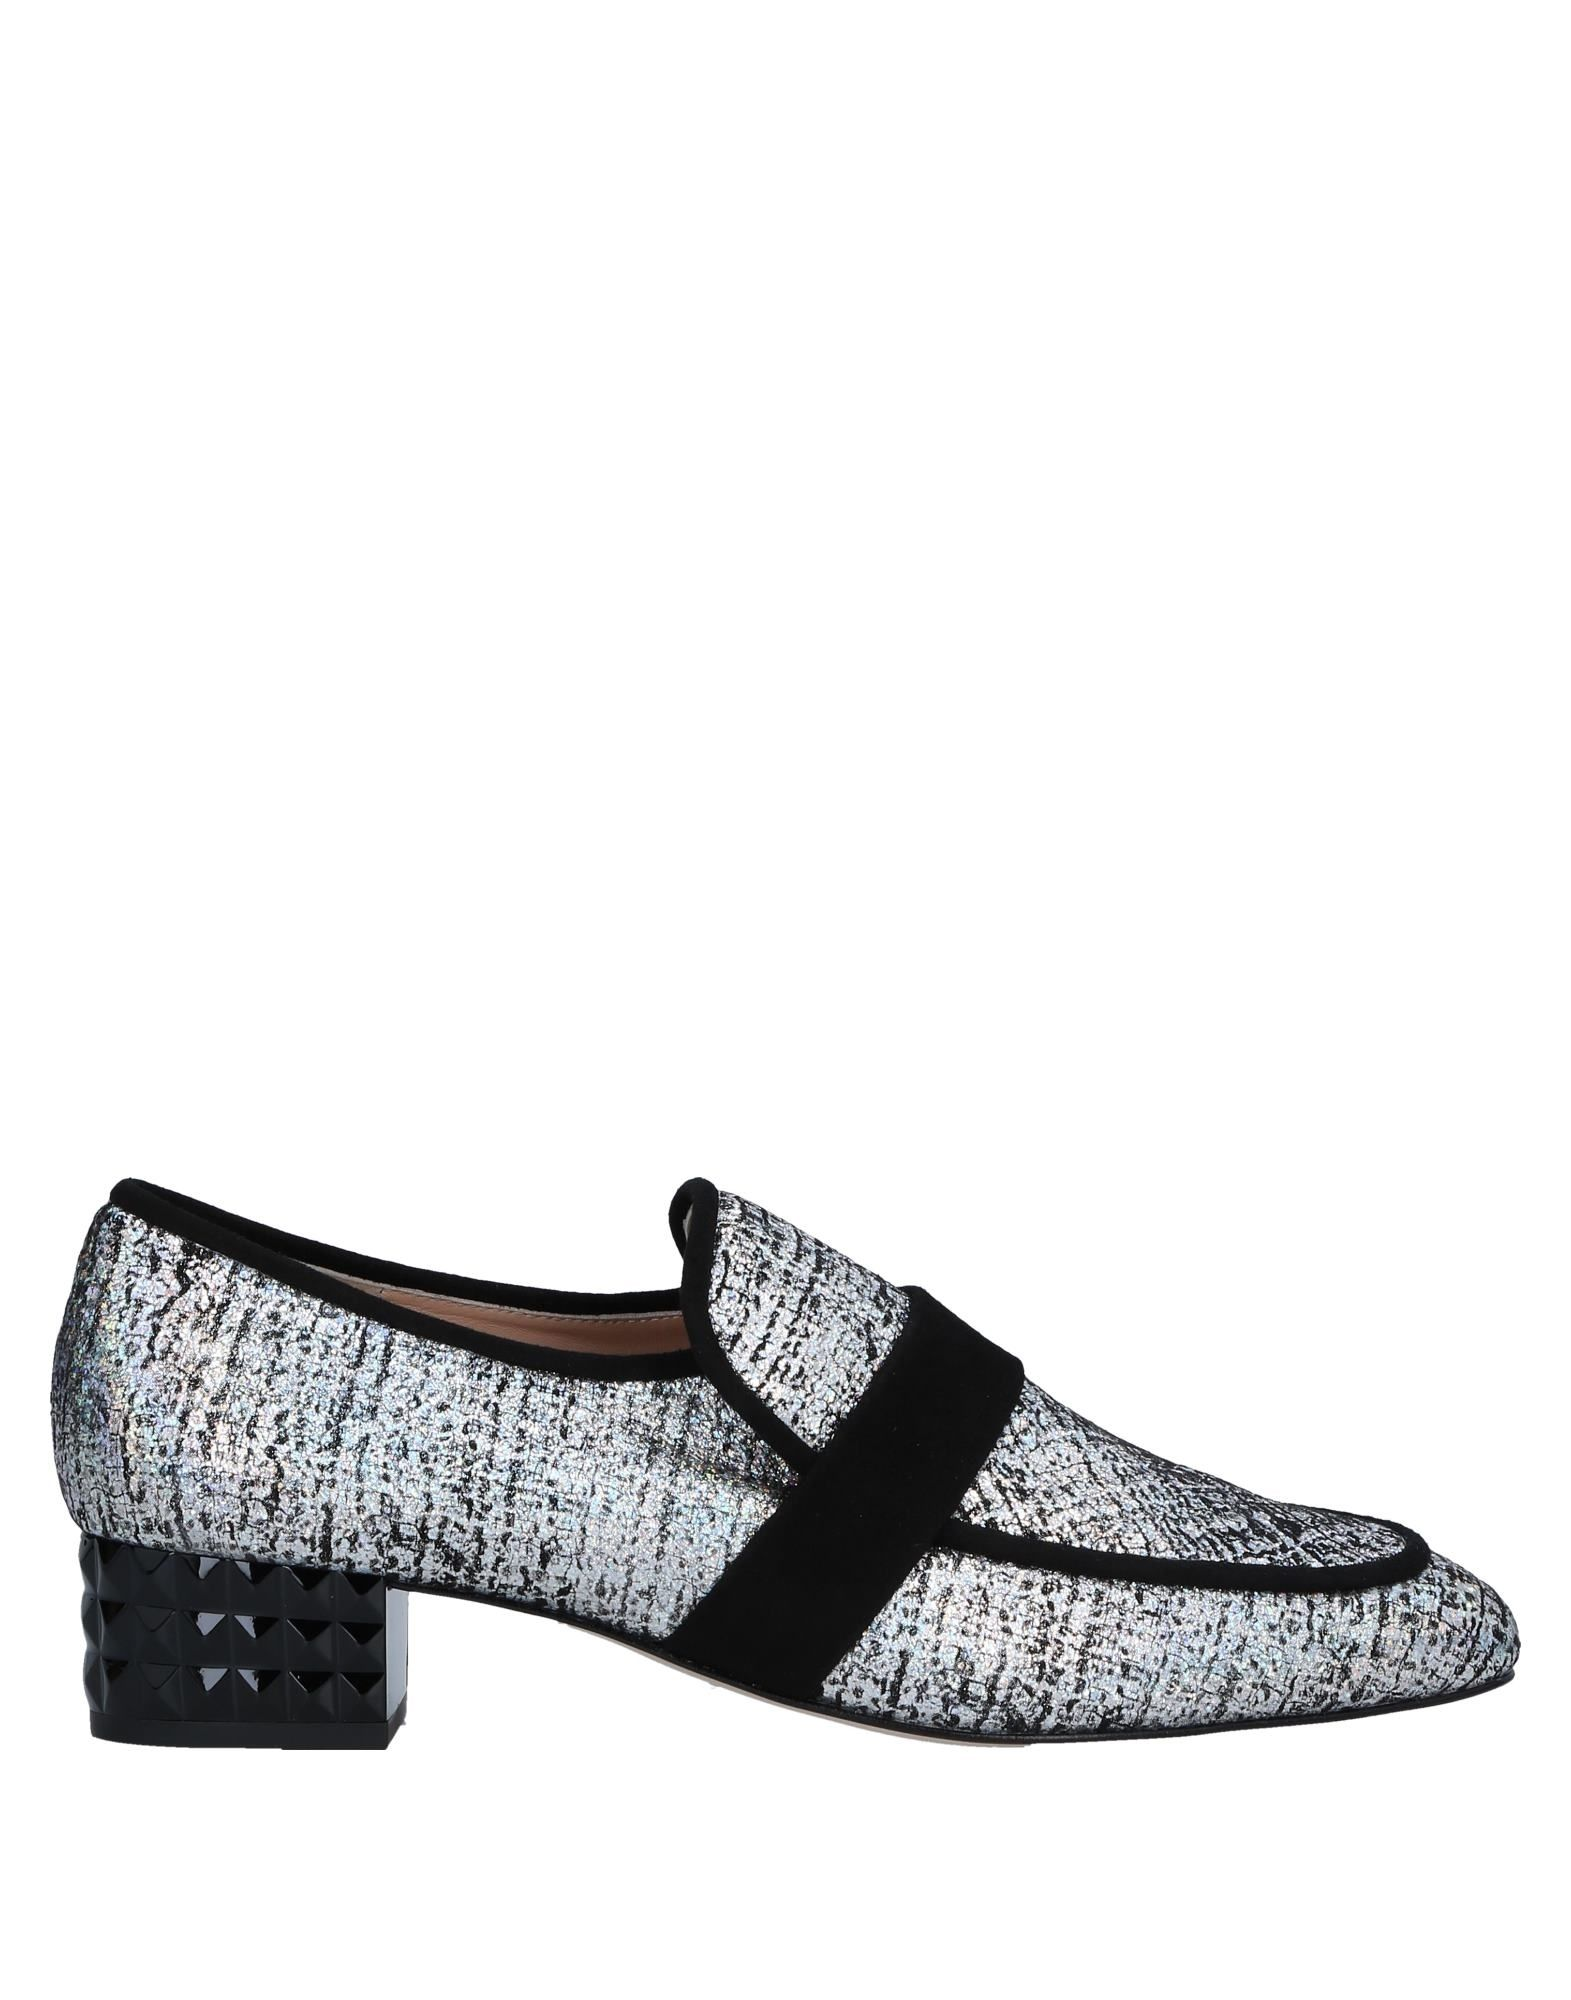 Hannibal Laguna Mokassins Damen  11533629AS Neue Schuhe